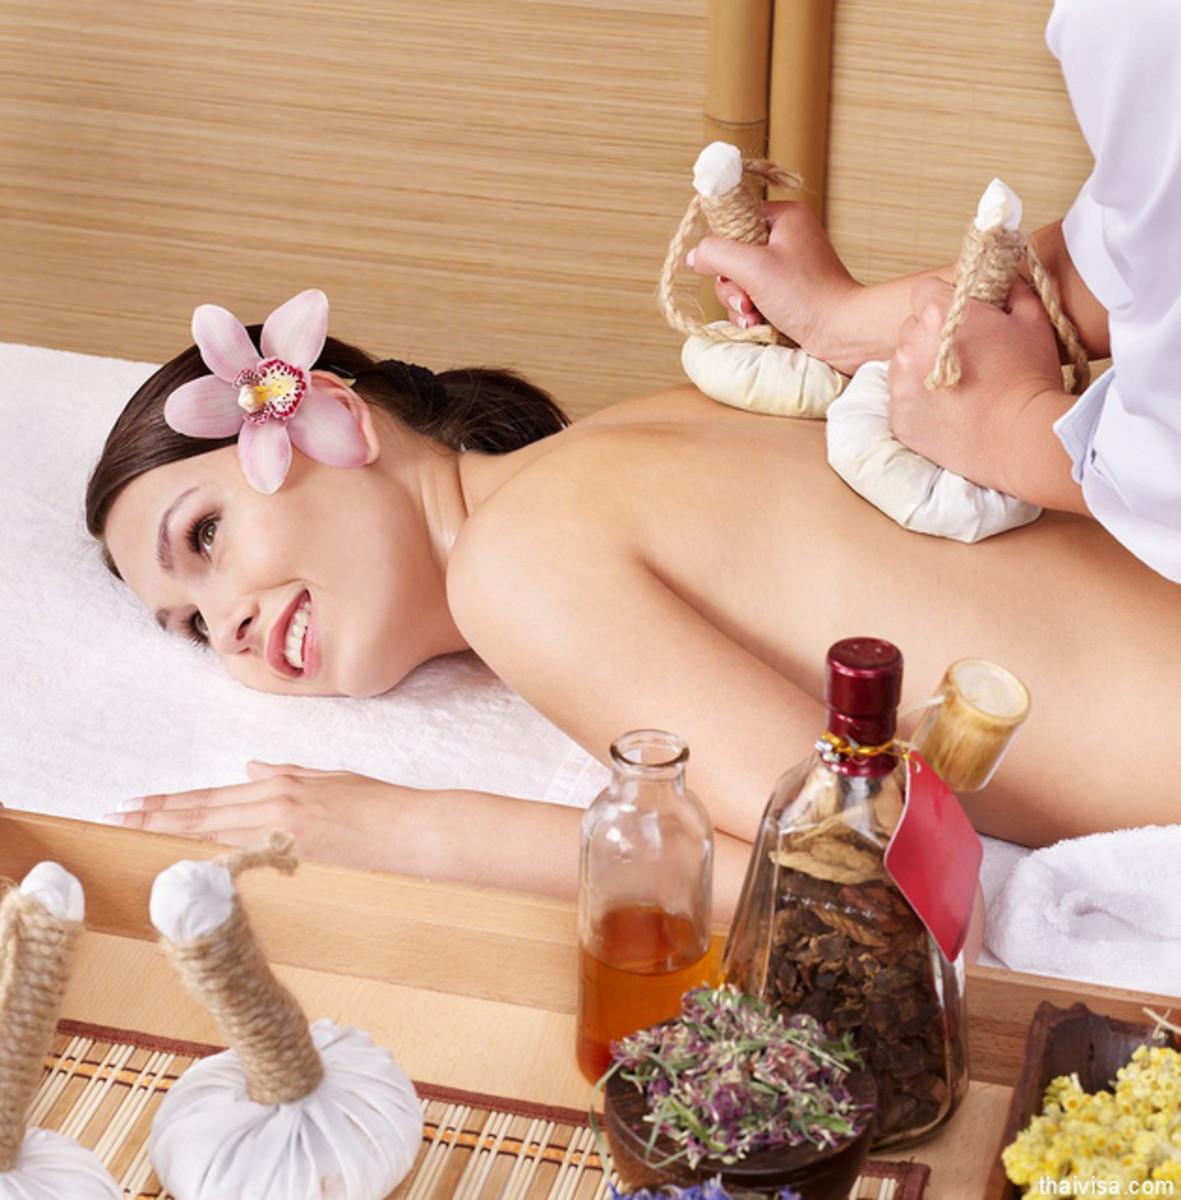 porrfilmer svenska thai massage guiden